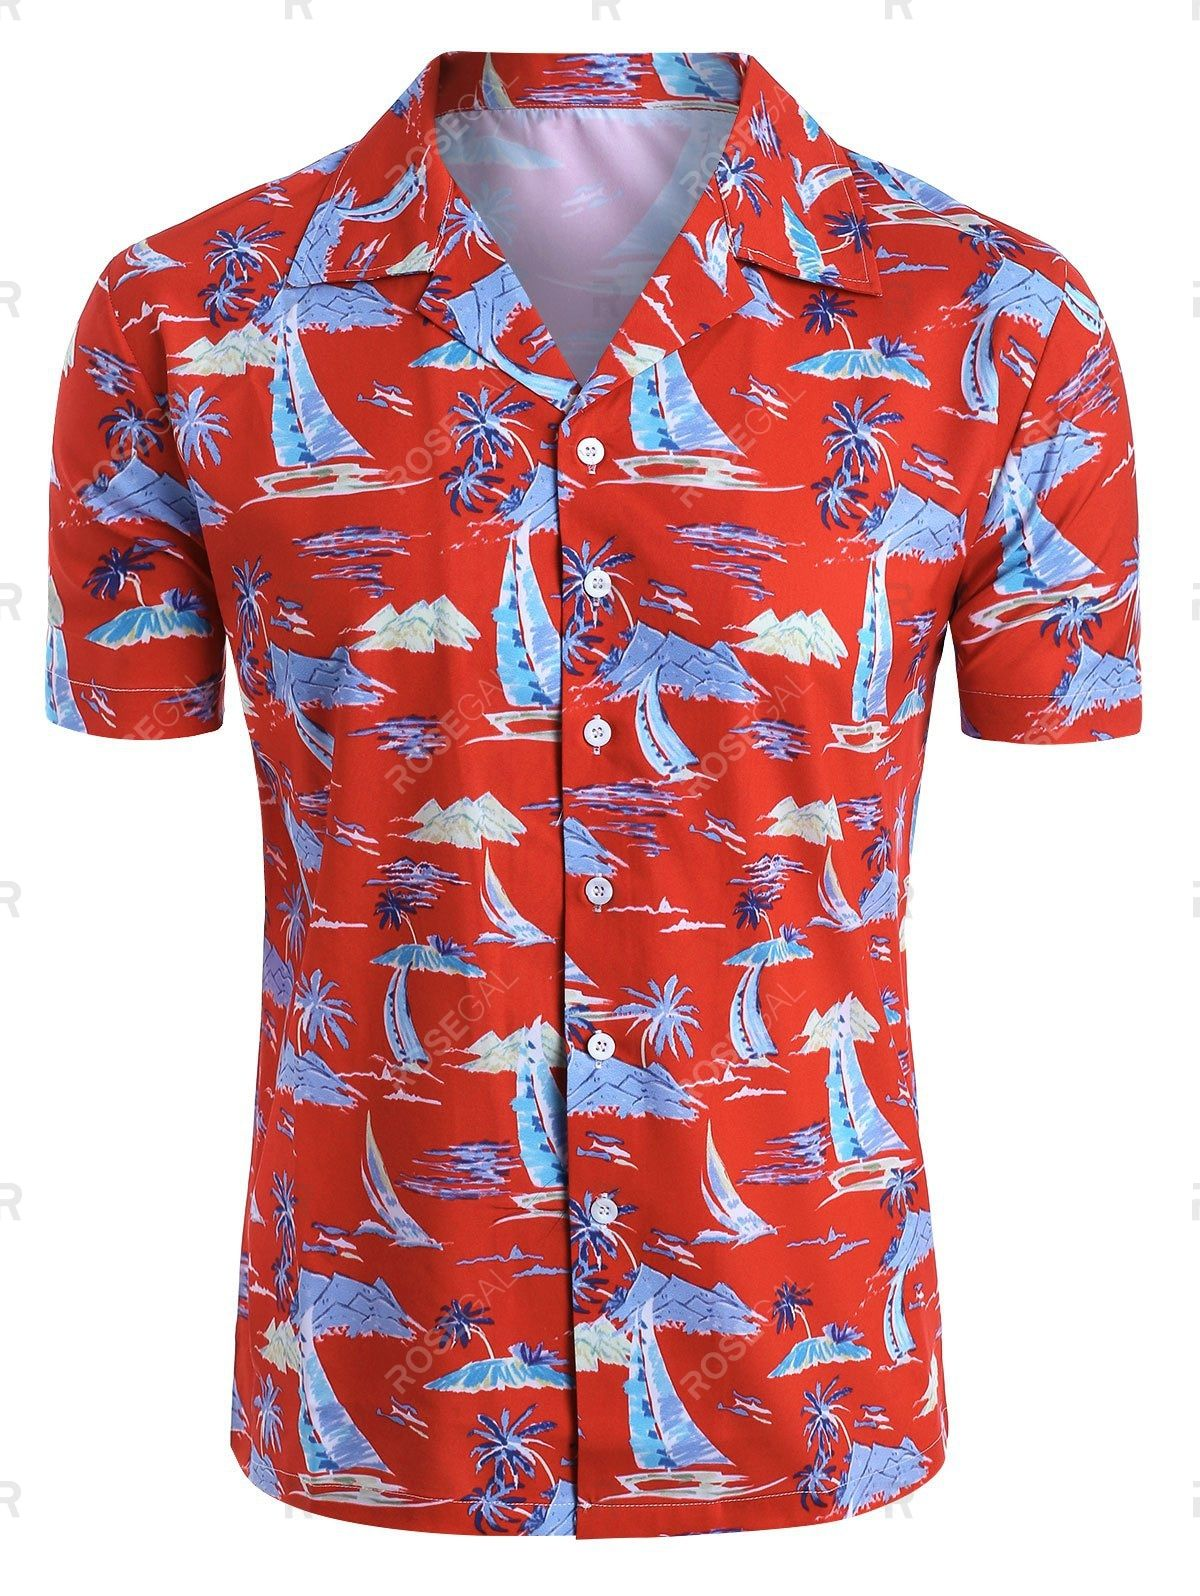 Palm Tree Sailboat Print Button Up Hawaii Shirt Ad Paid Sailboat Tree Palm Print Shirt In 2020 Print Buttons Hawaii Shirt Casual Button Down Shirt